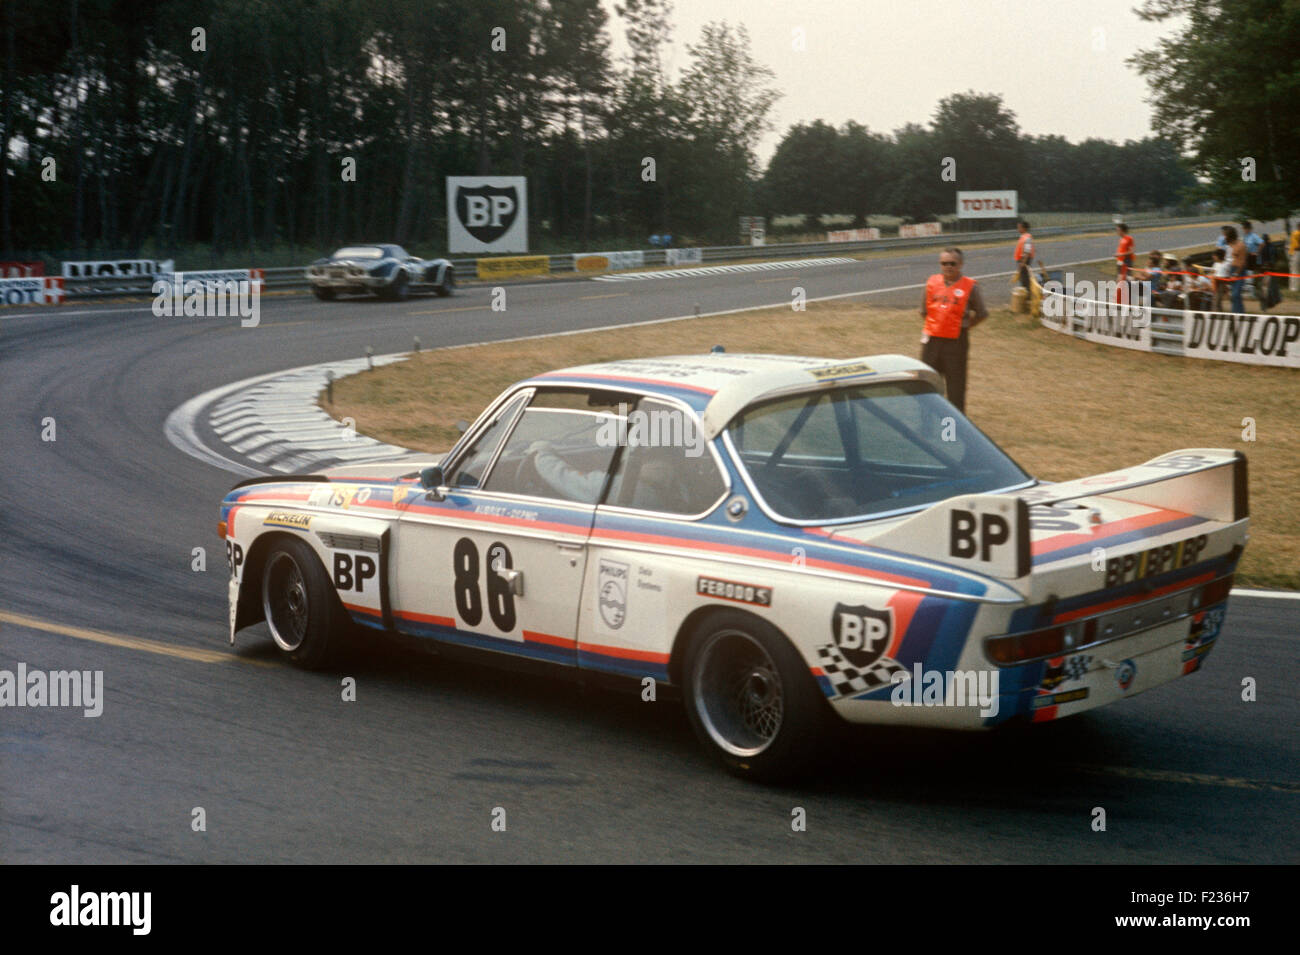 bmw e9 csl 3 0 group 2 1973 racing cars. Black Bedroom Furniture Sets. Home Design Ideas